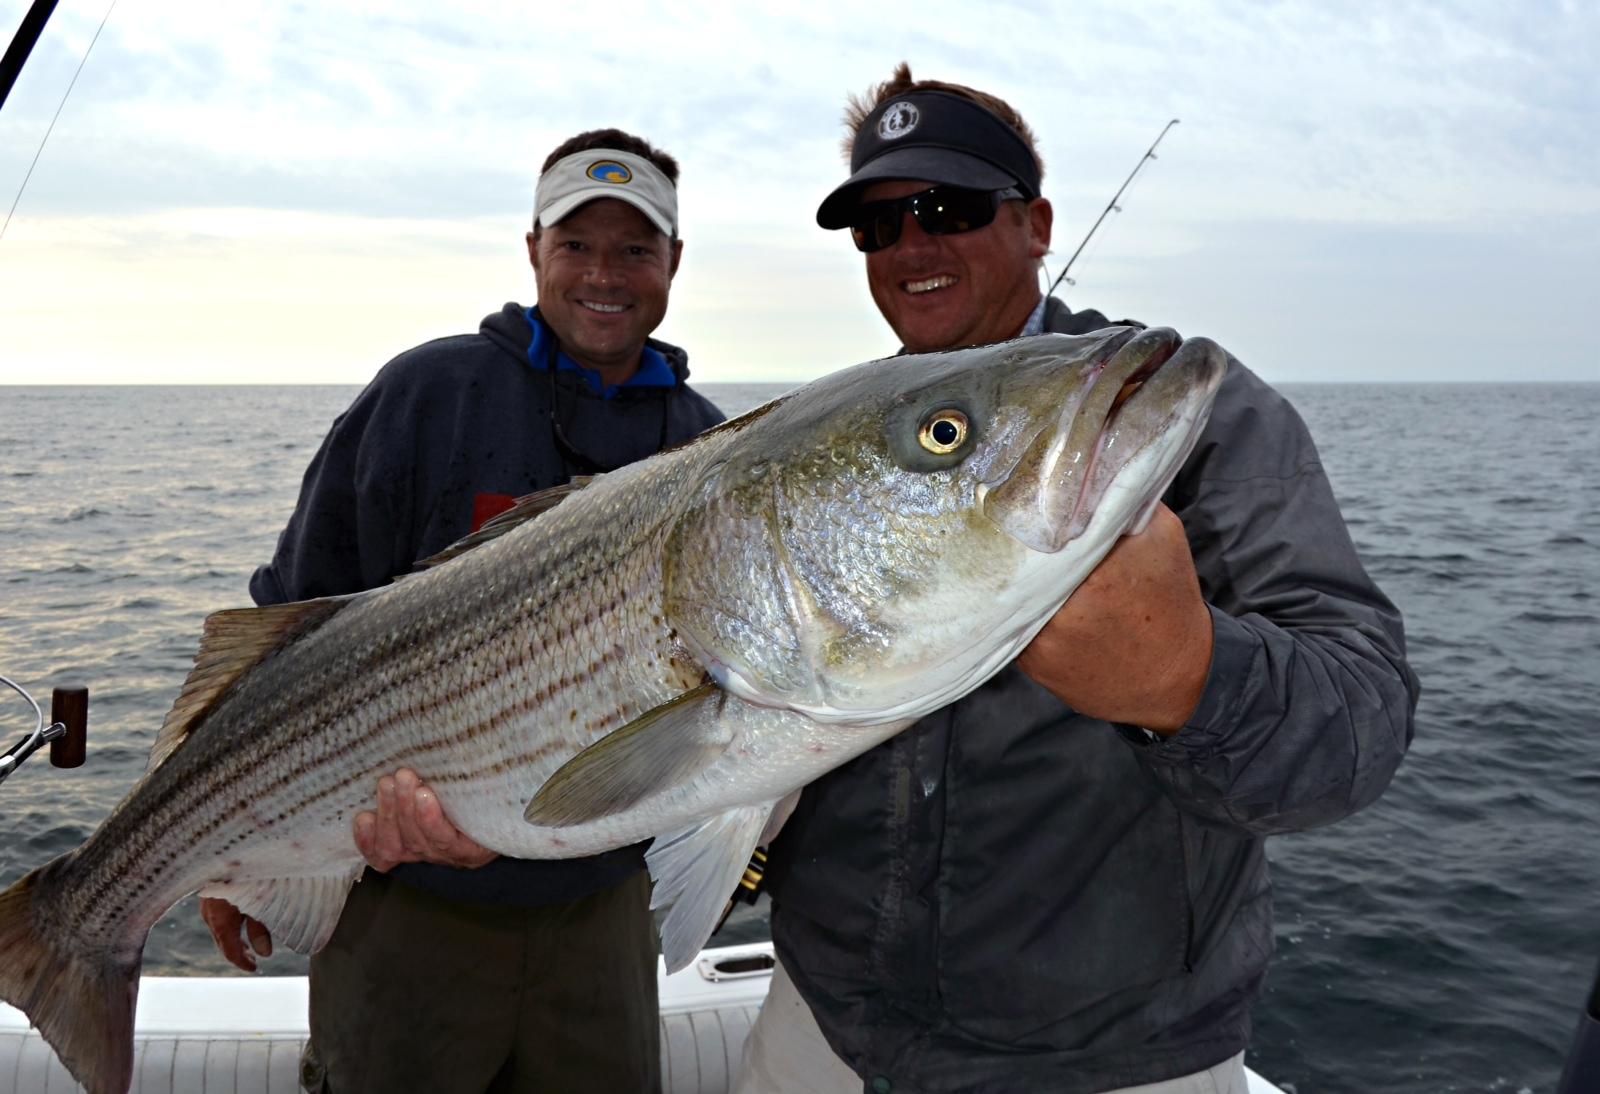 Block island fishworks fishing charters and guides for Block island fishing charters